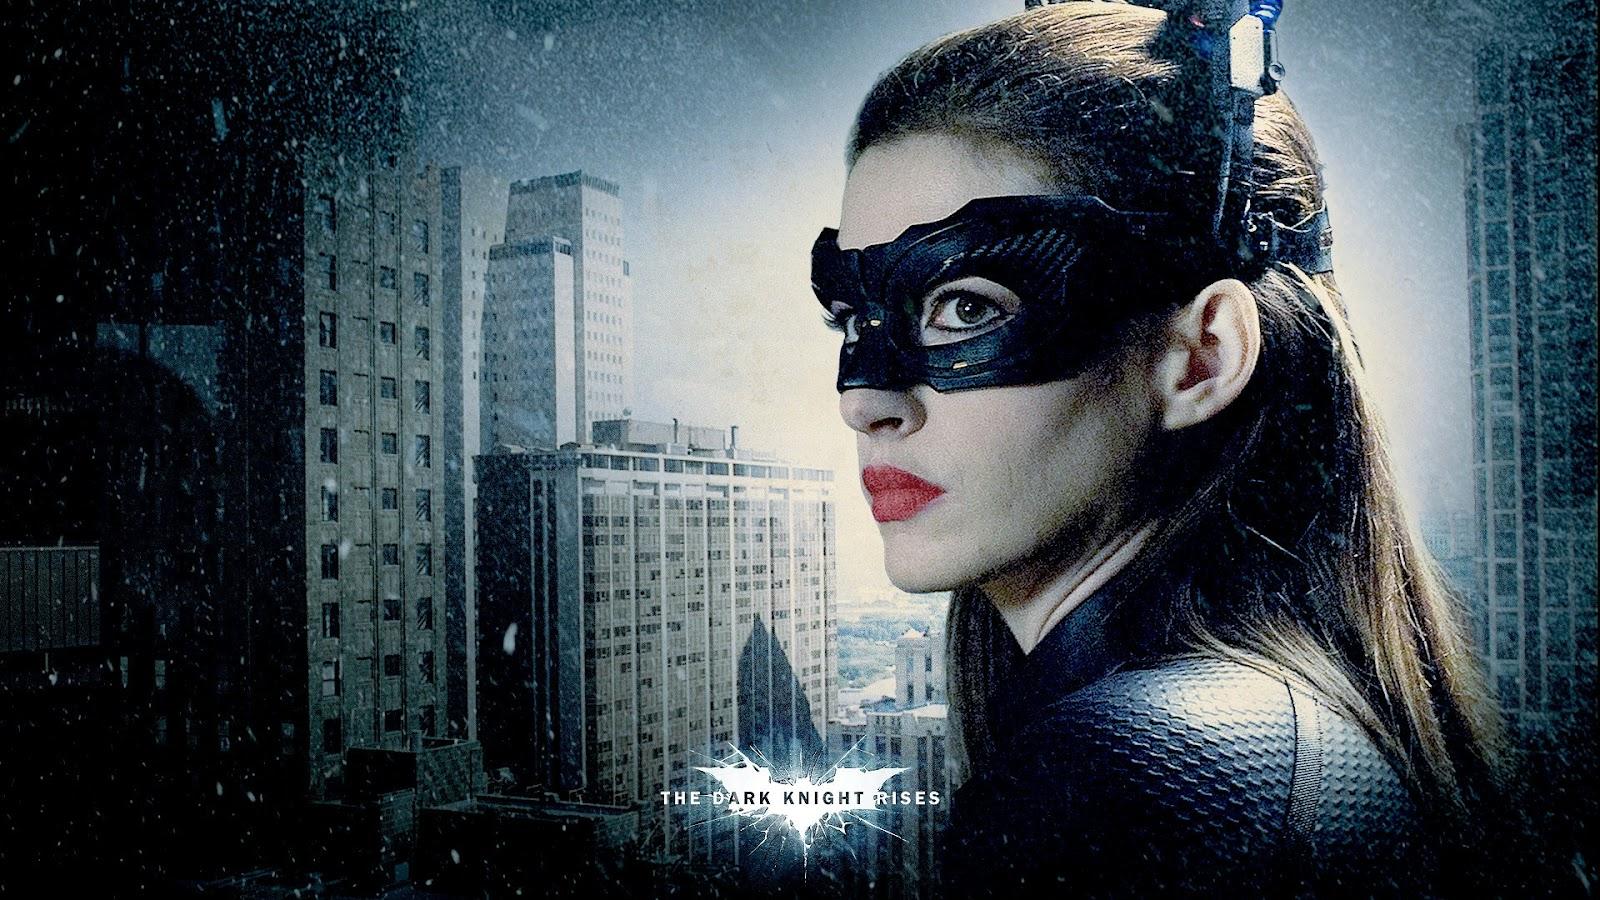 46 Anne Hathaway Catwoman Wallpaper On Wallpapersafari